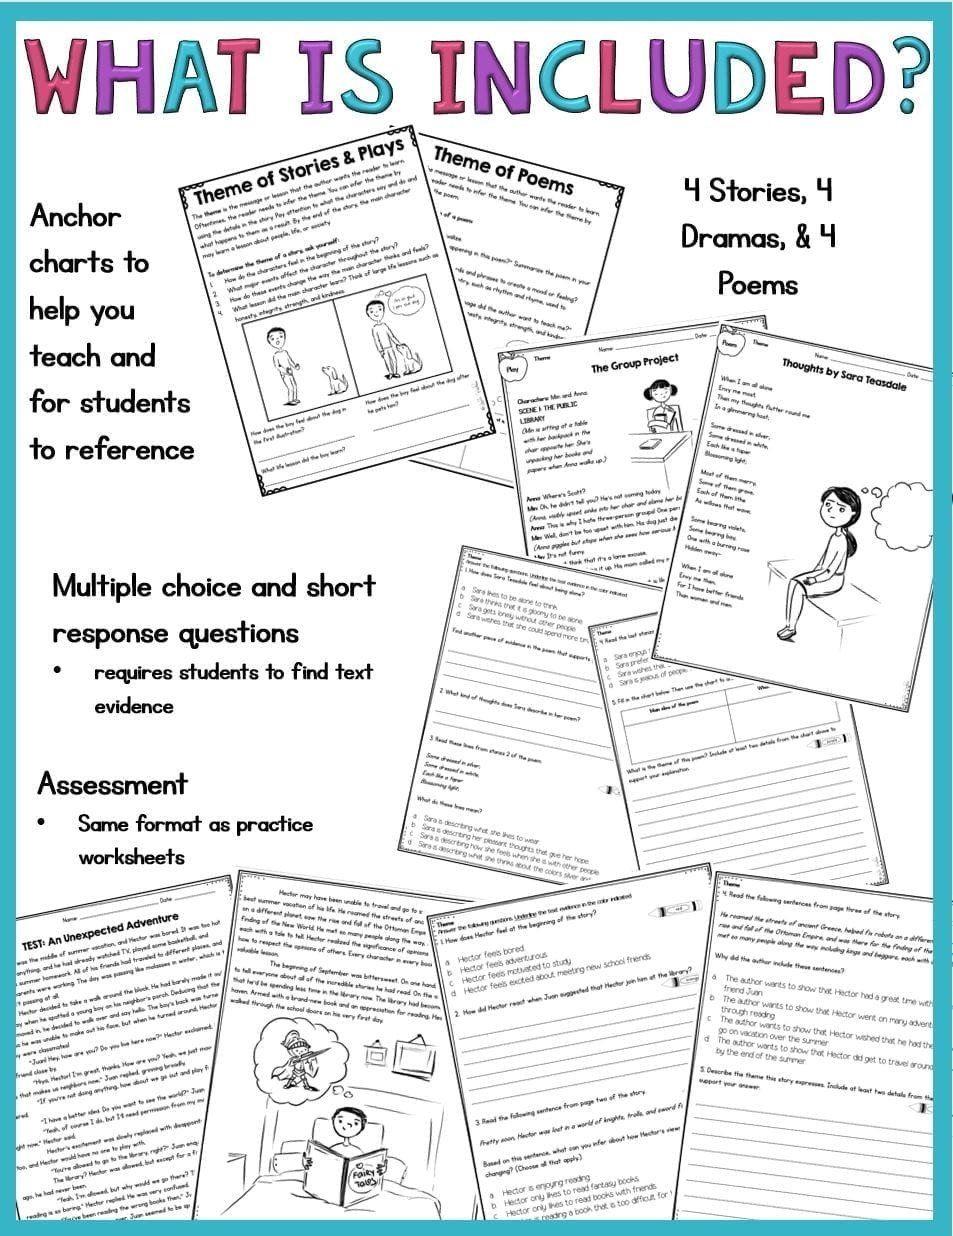 Theme Worksheet 4th Grade theme In Stories Plays and Poems 4th Grade Rl 4 2  and 5th Grade Rl 5 2   Text evidence [ 1236 x 953 Pixel ]